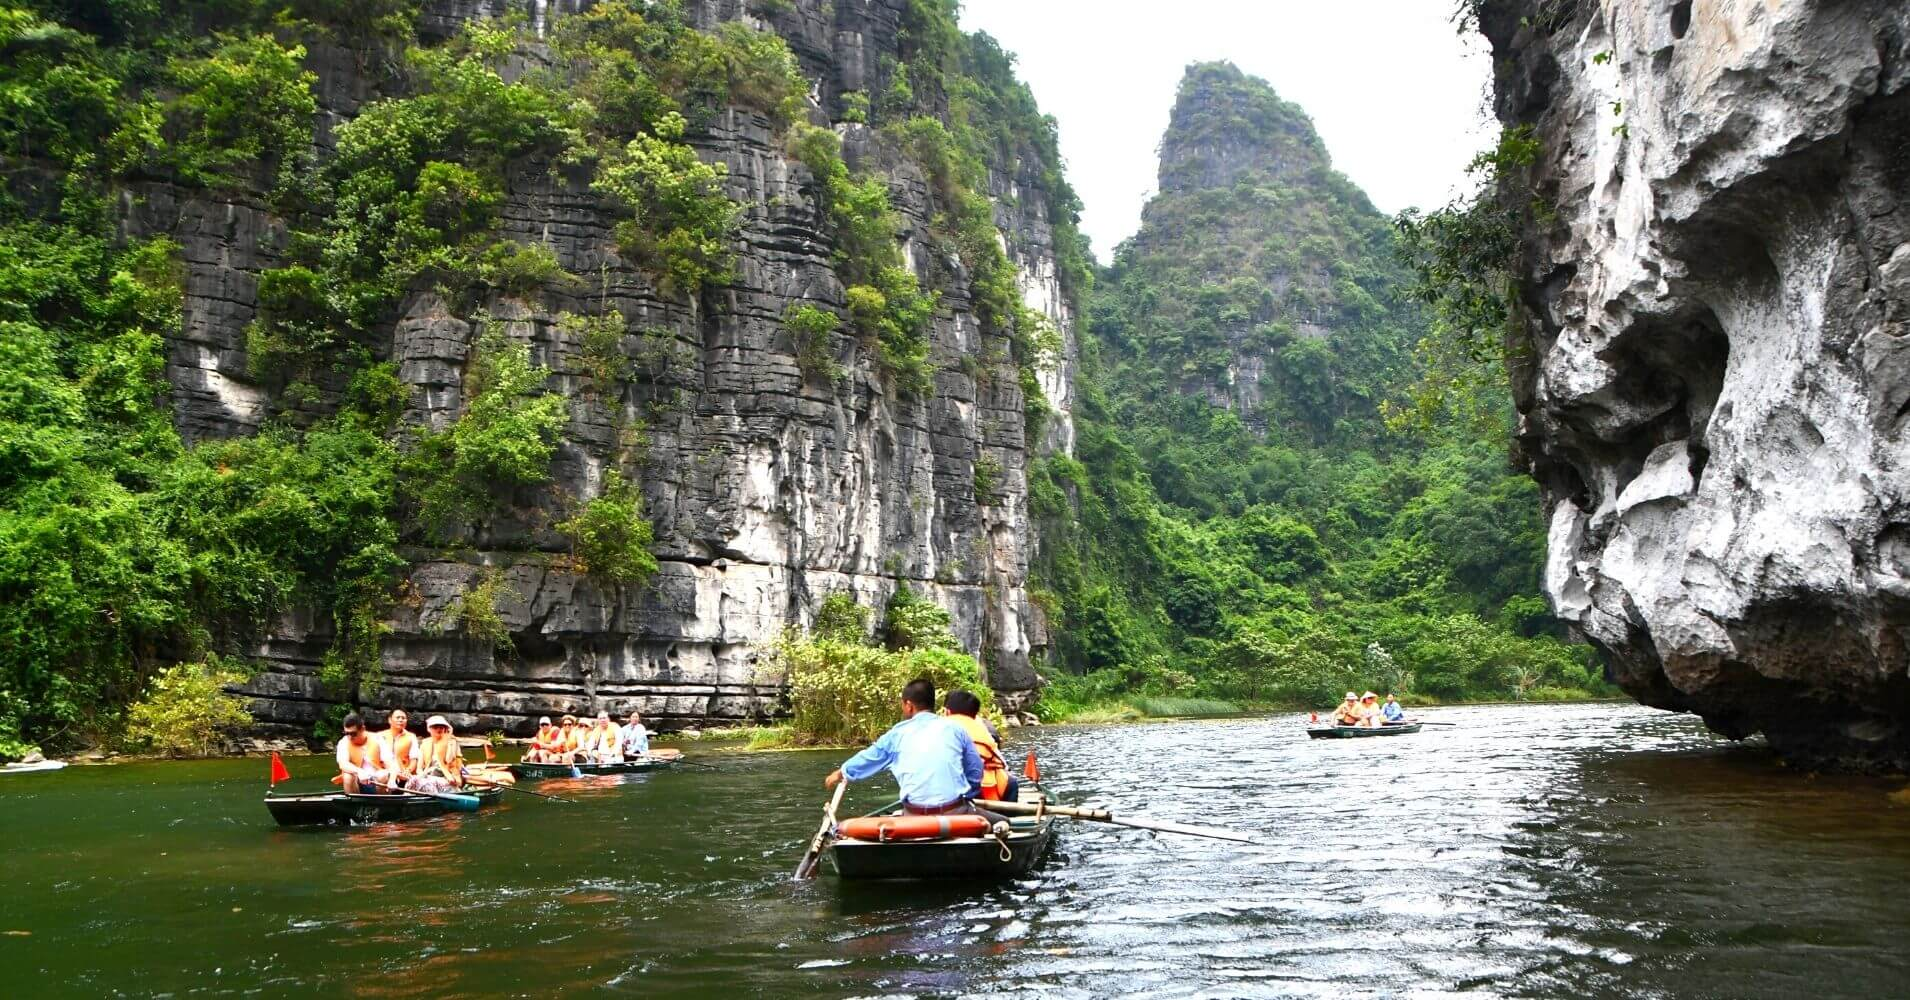 Trang an. Bahía de Halong Seca. Vietnam.